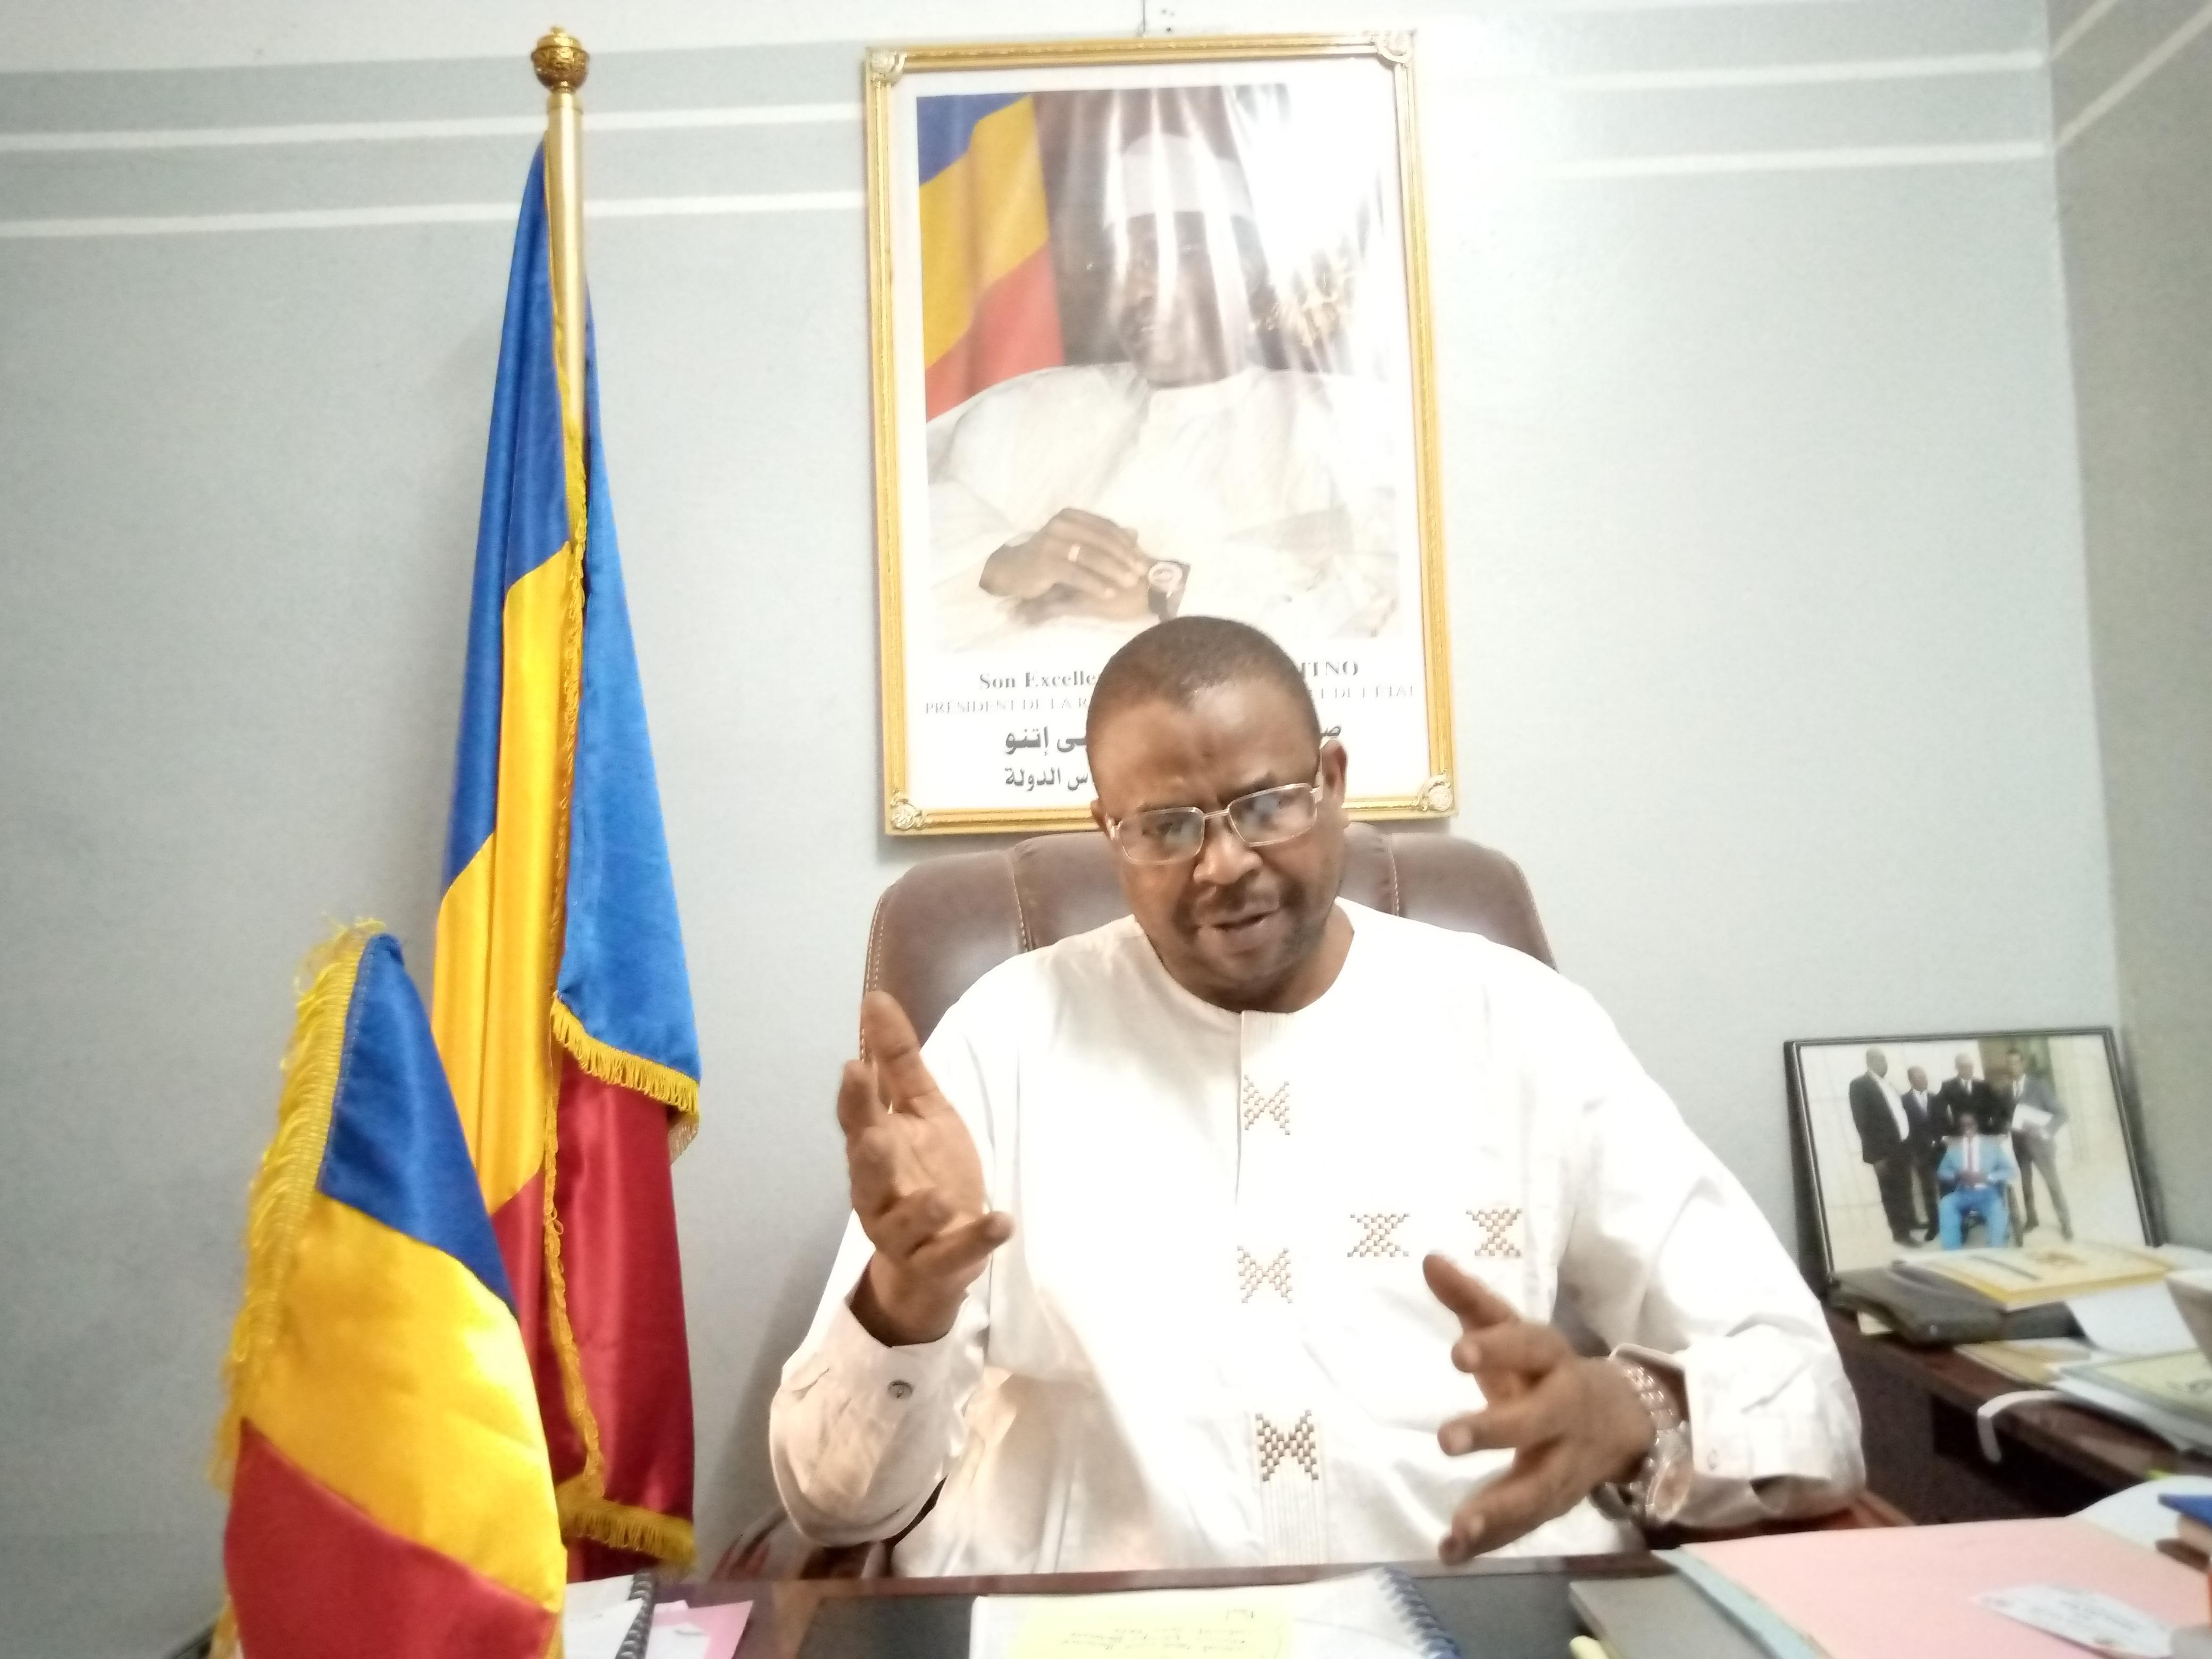 Processus électoral : Djida Oumar Mahamat interpelle les différents acteurs